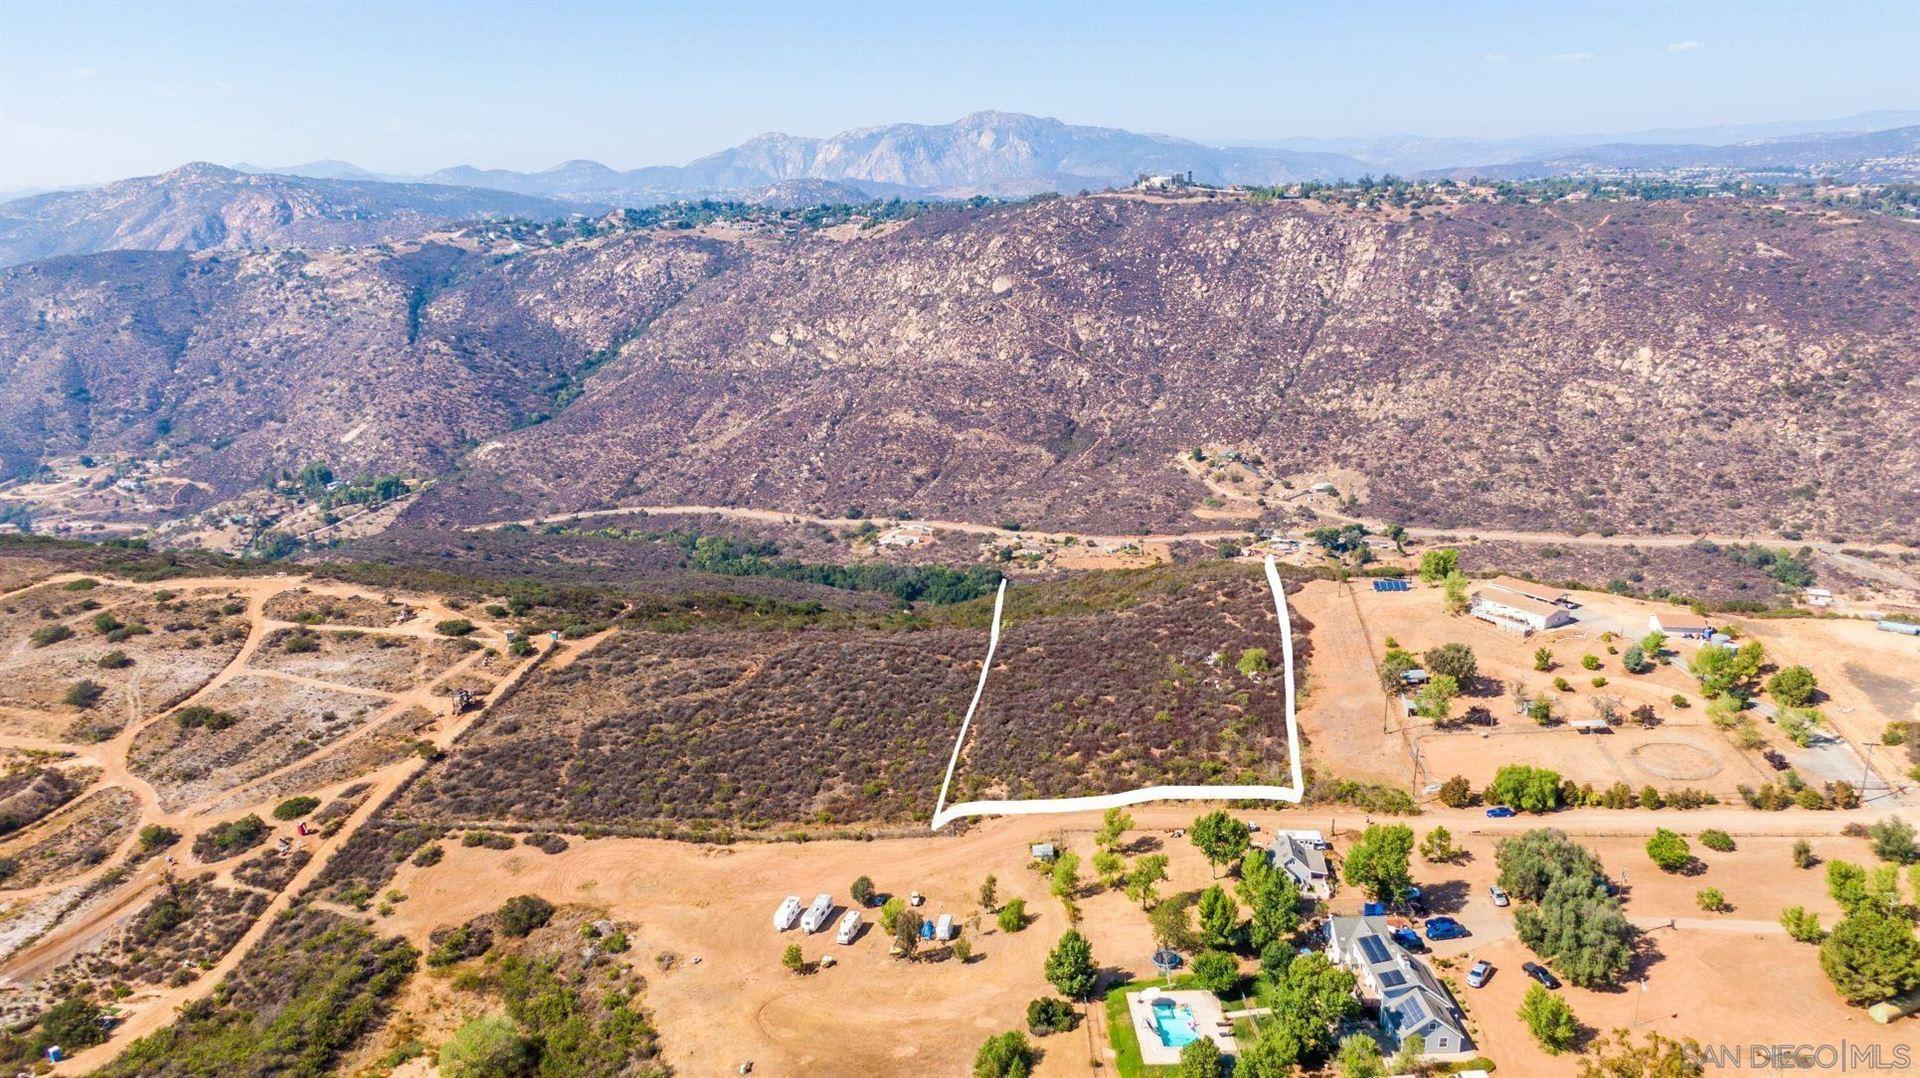 Photo of 16352 Coronado Terrace Dr, Alpine, CA 91901 (MLS # 210025684)